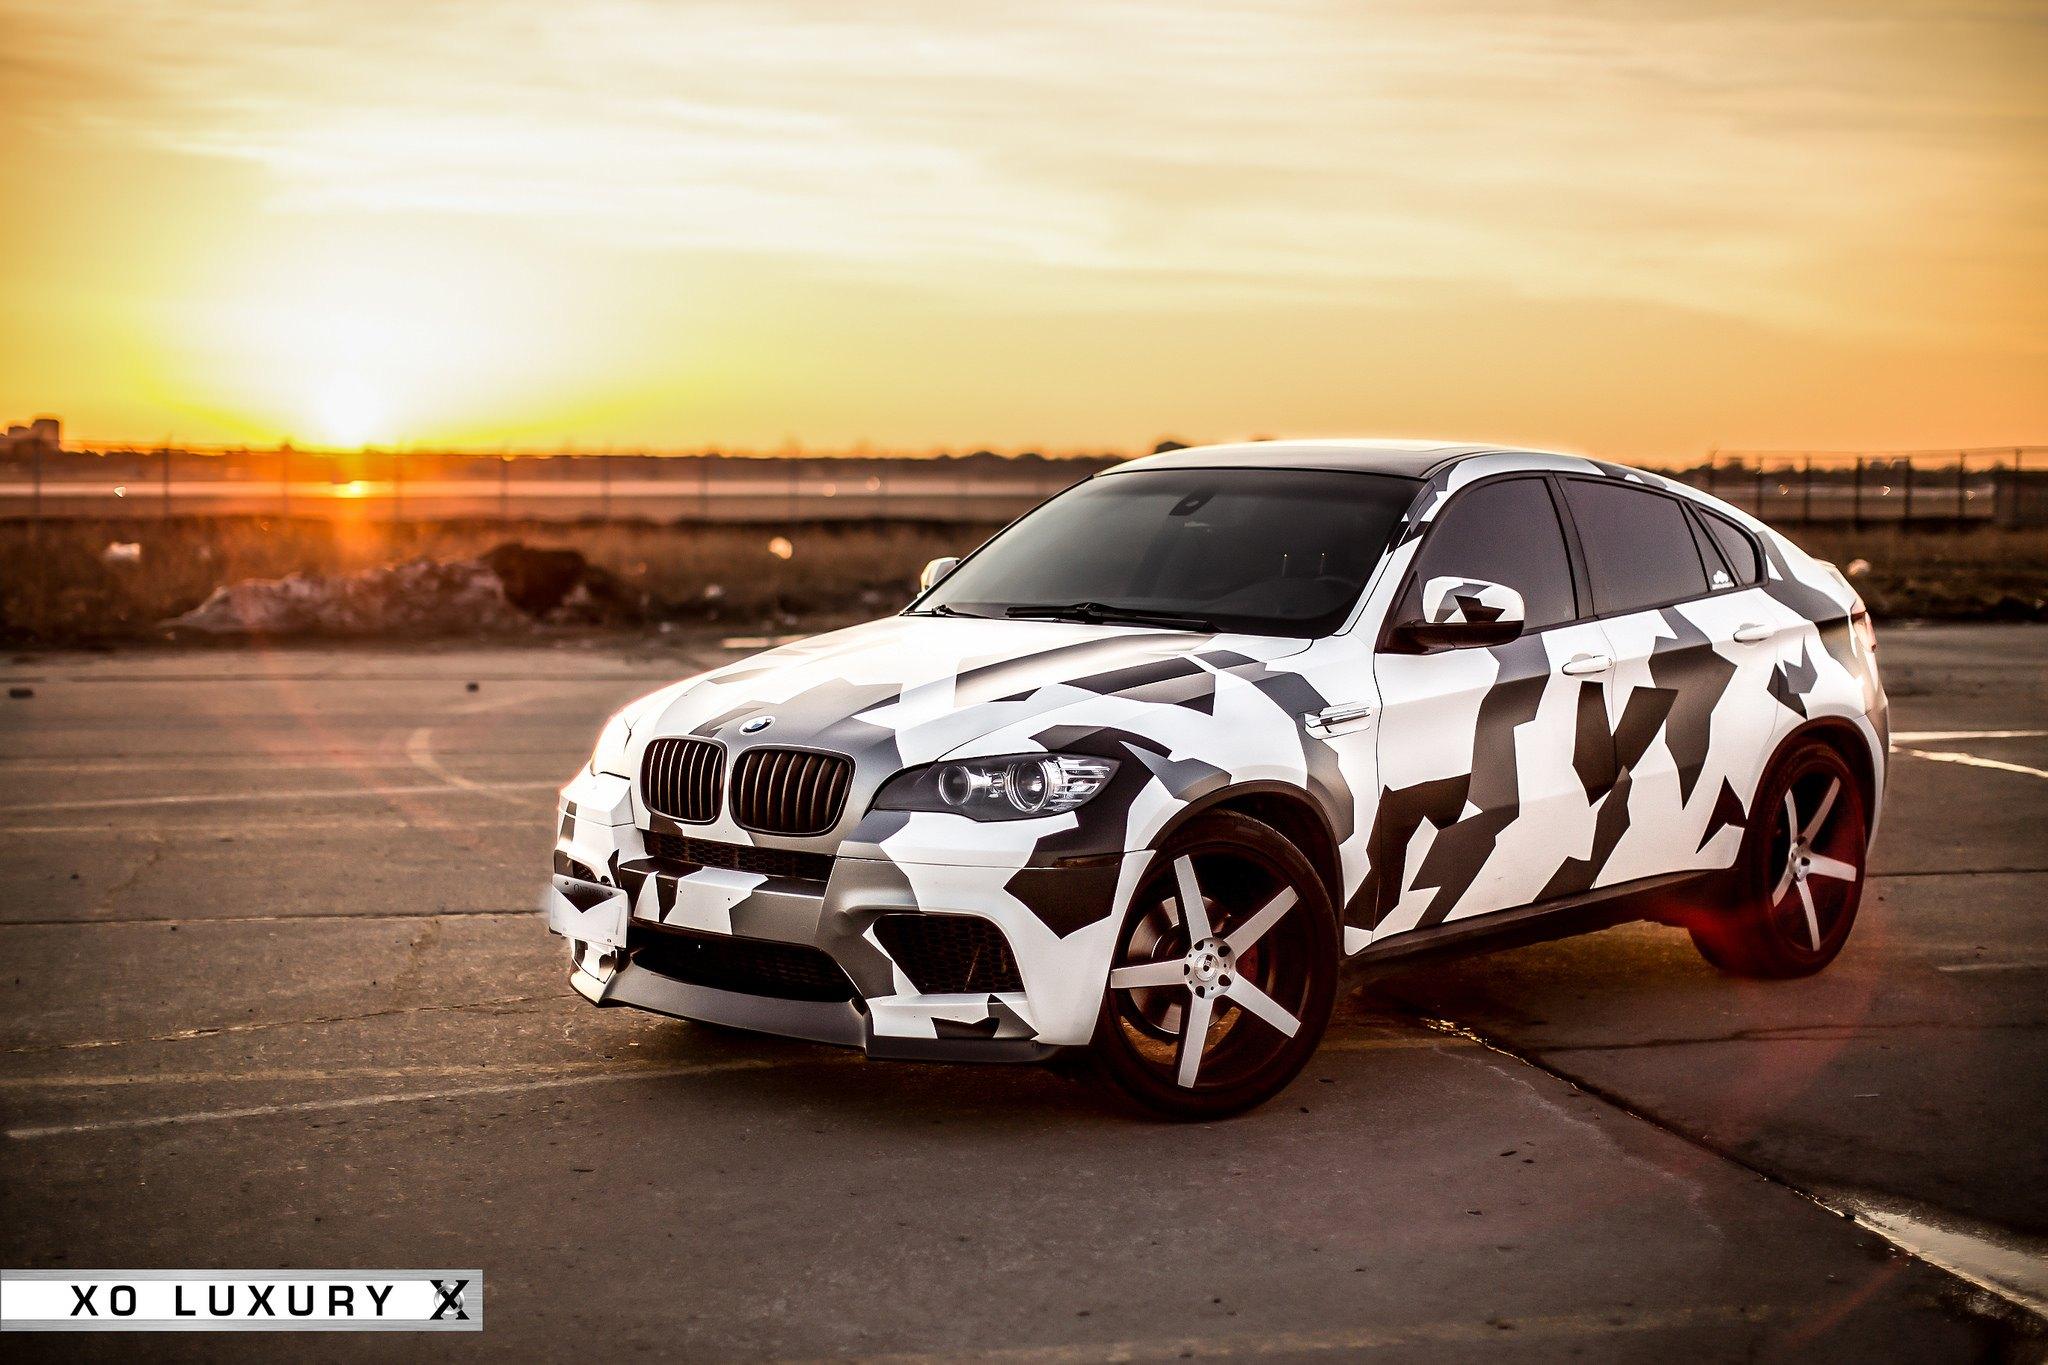 Bmw X6 M With Black And White Camo Wrap On Xo Luxury Rims